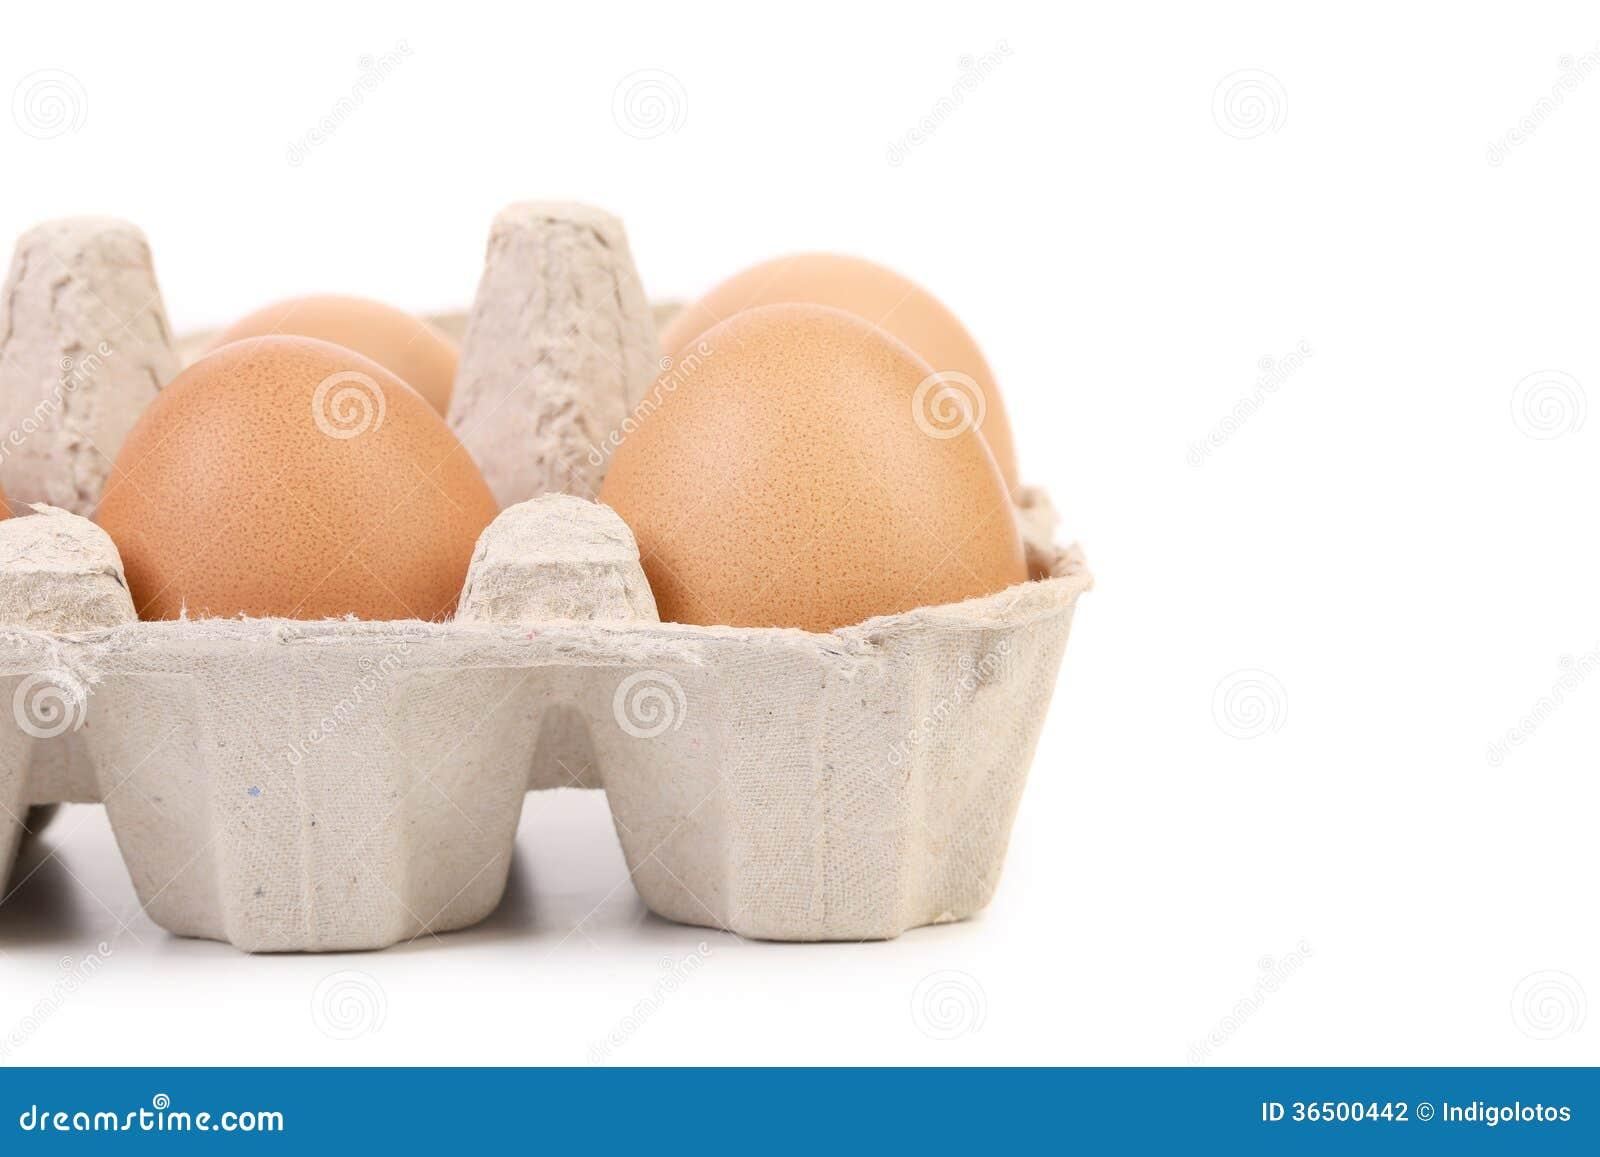 Uova di Brown in scatola delle uova.